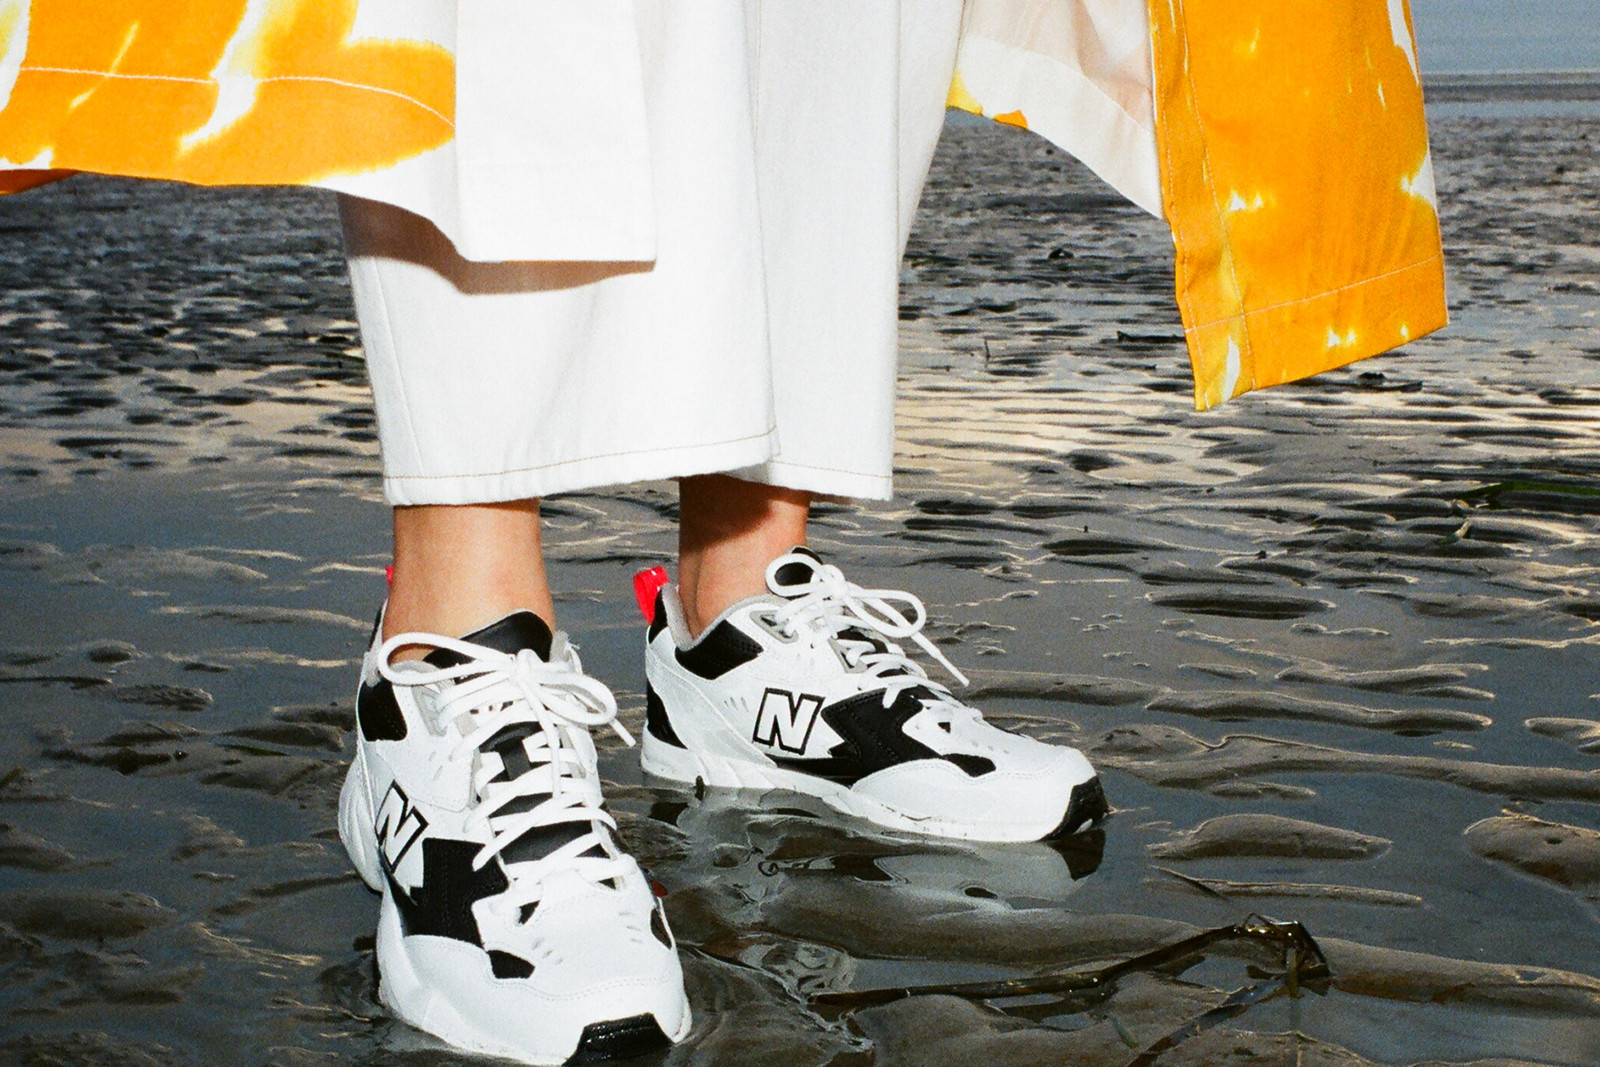 fa6ed4bc824 ... New Balance Sneakers Sneaker Spring Summer 2019 608v1 Black White Dries  Van Noten Orange Coat White